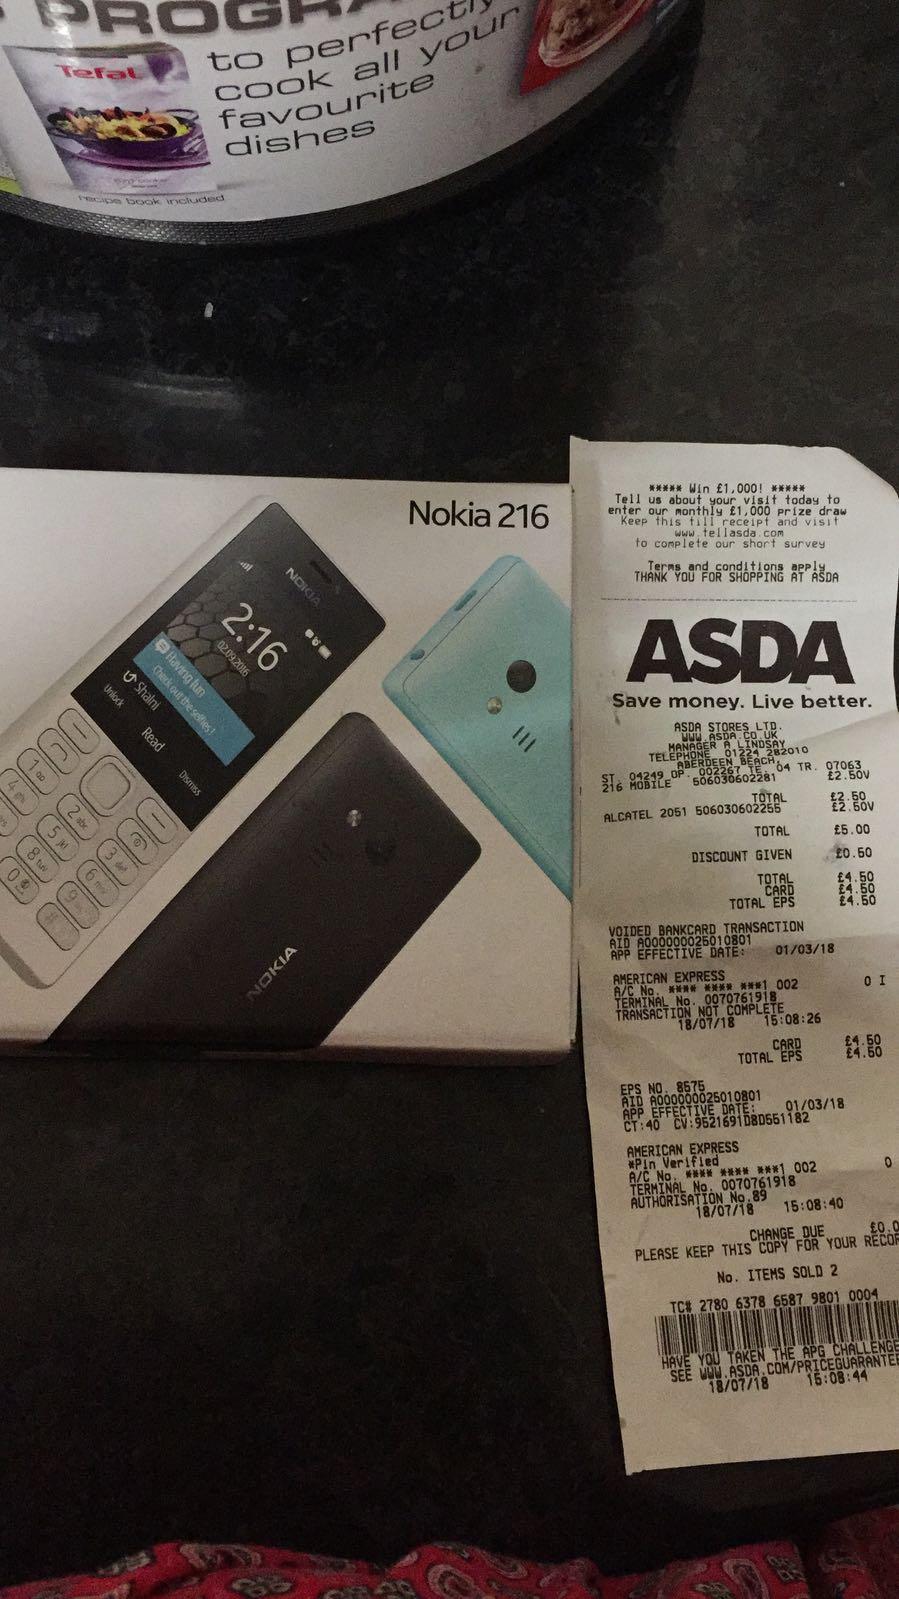 Nokia 216 for £2.50 @ Asda instore Aberdeen (Beach Store)